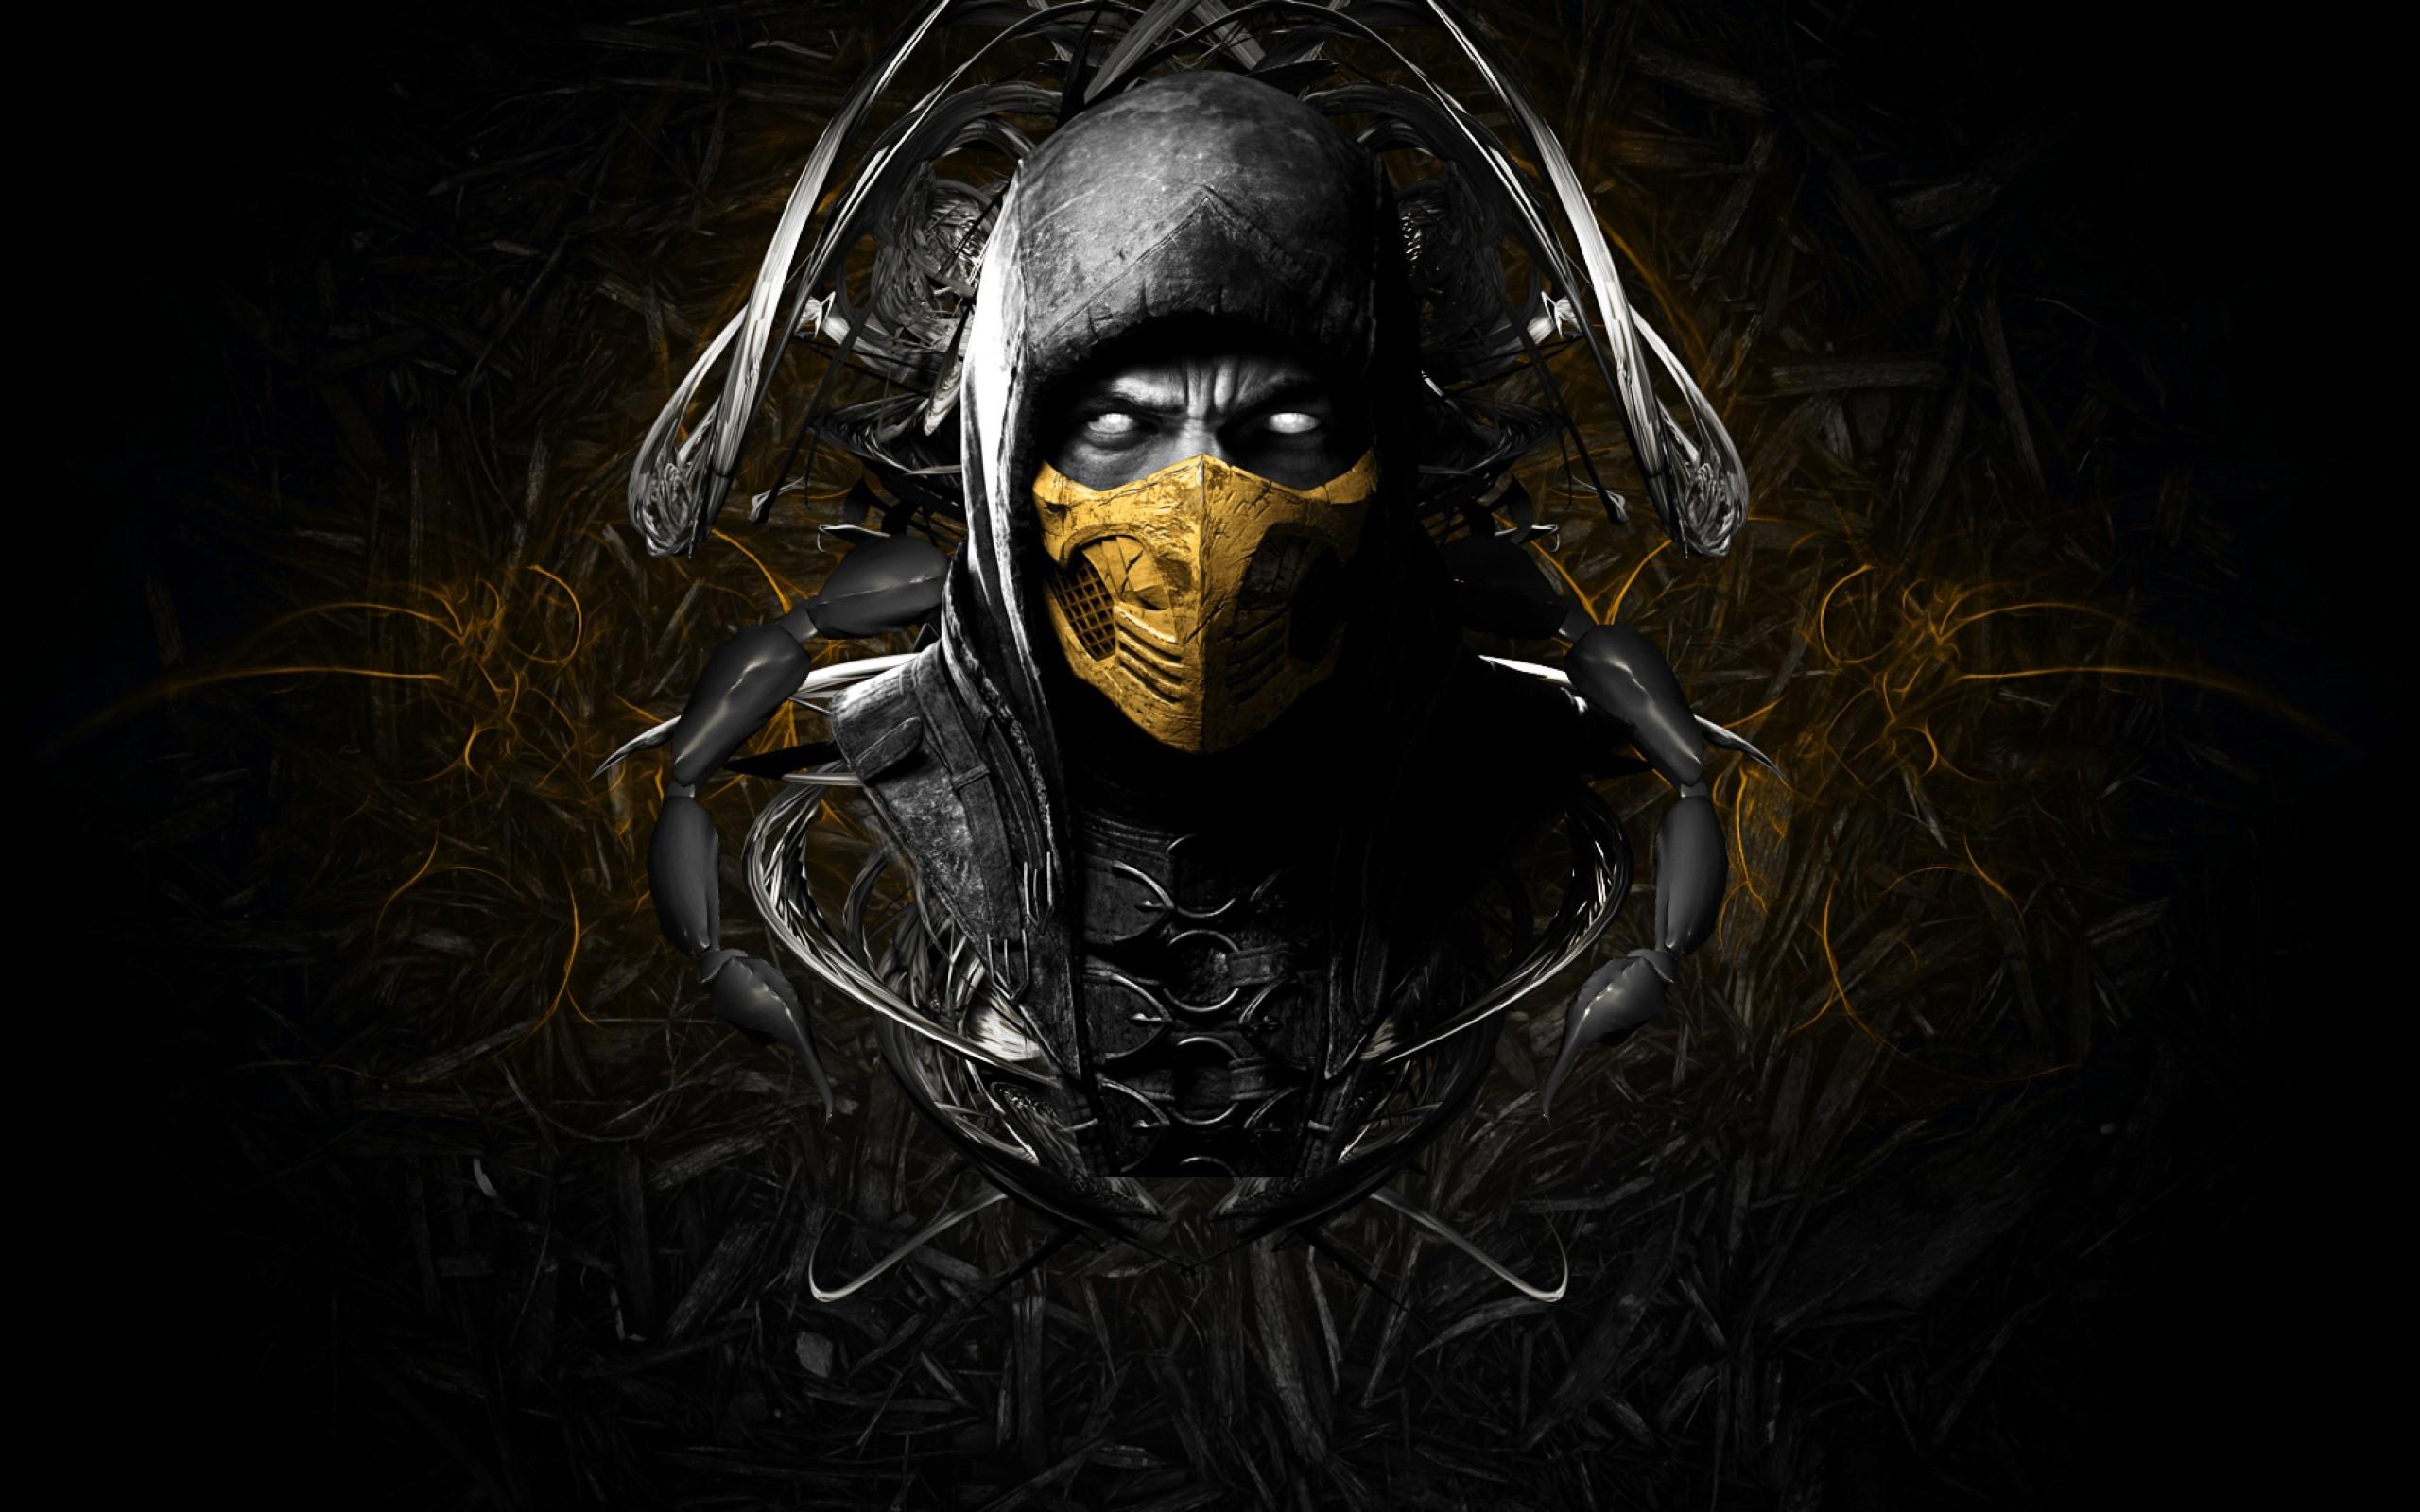 Mortal Kombat images